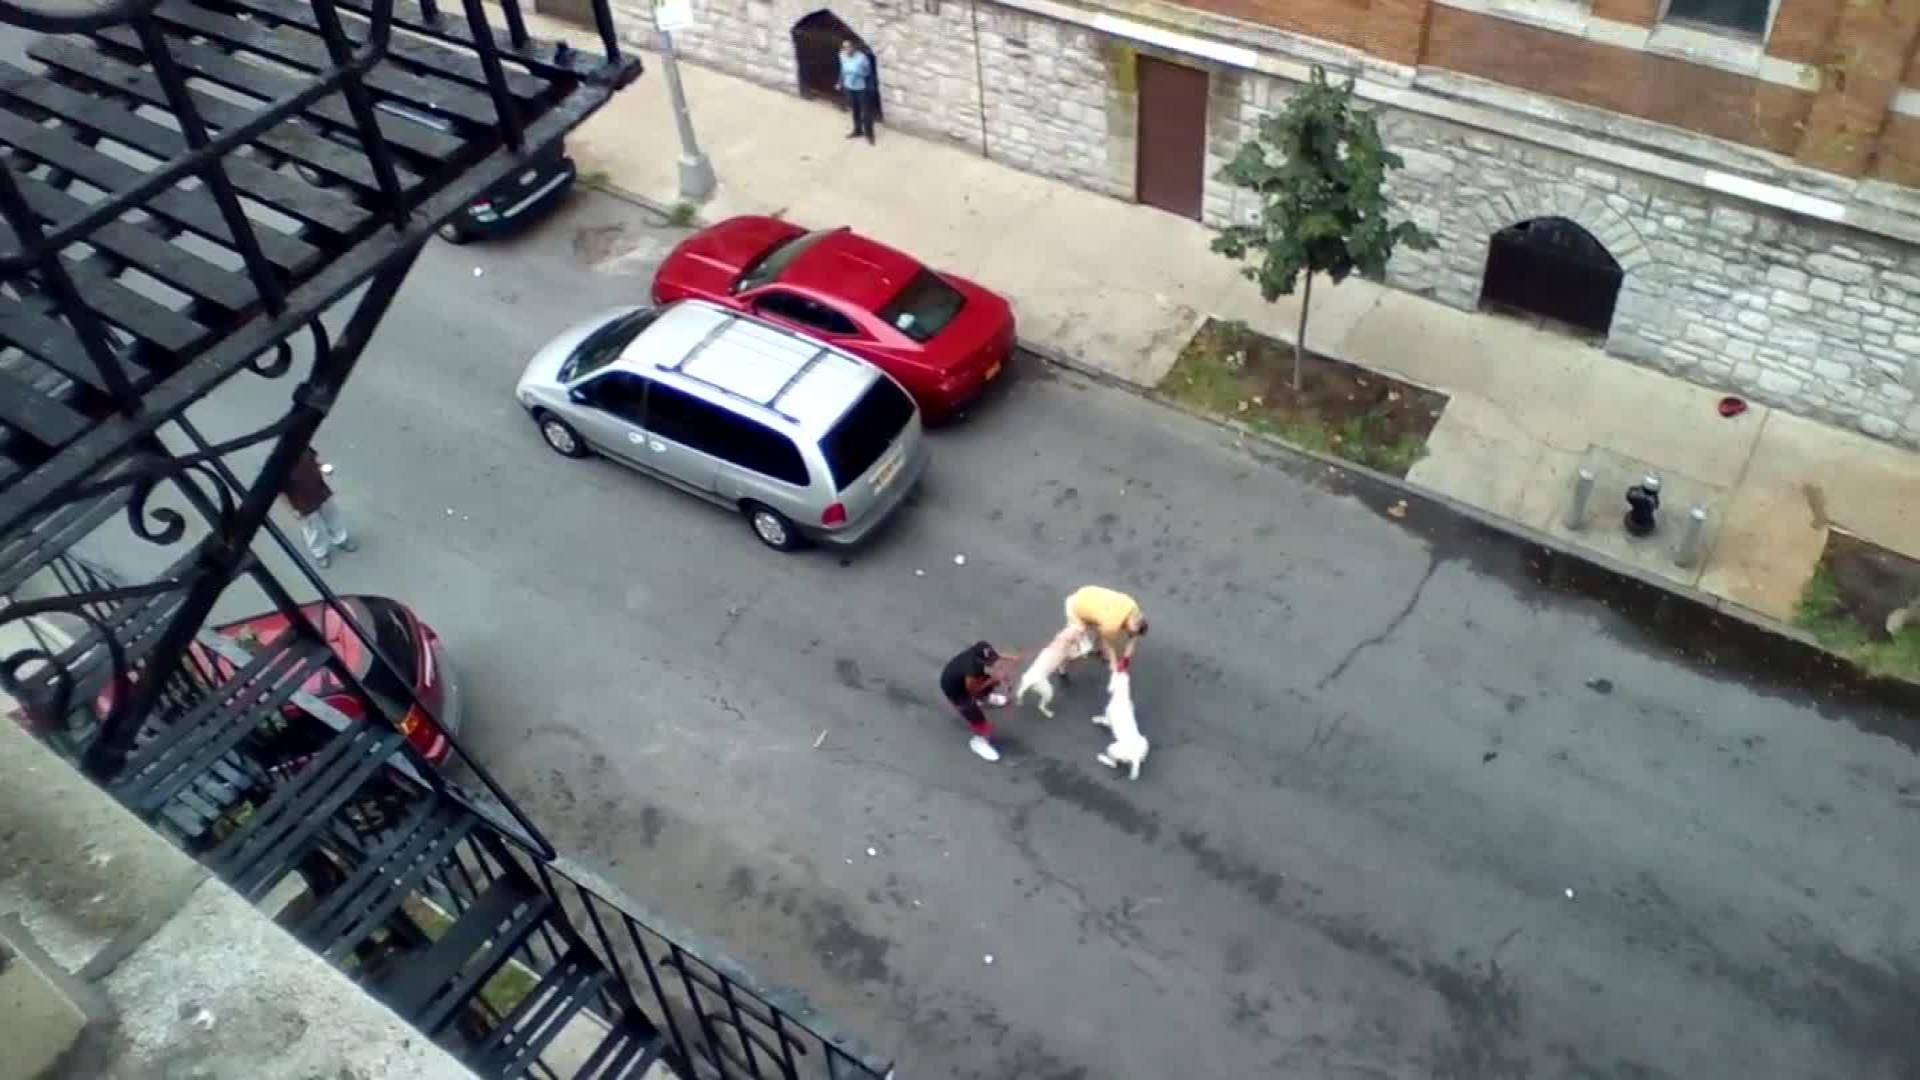 Pit bulls attack man in New York - CNN Video